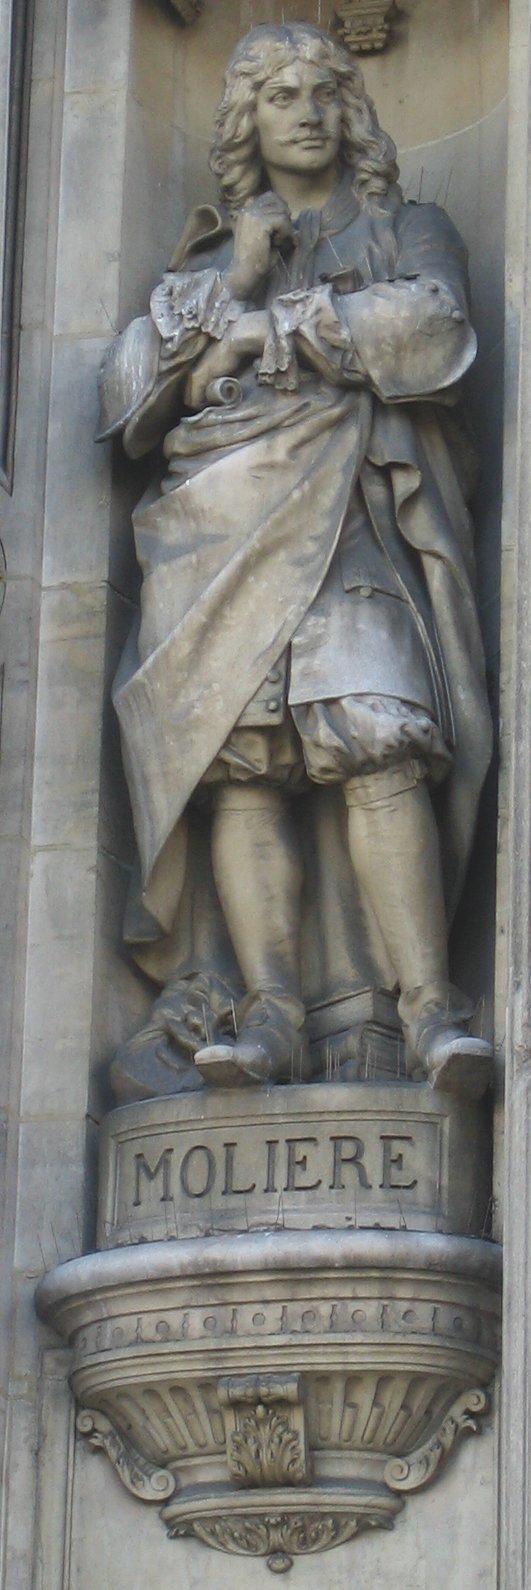 http://upload.wikimedia.org/wikipedia/commons/5/5b/Moliere-statue.jpg